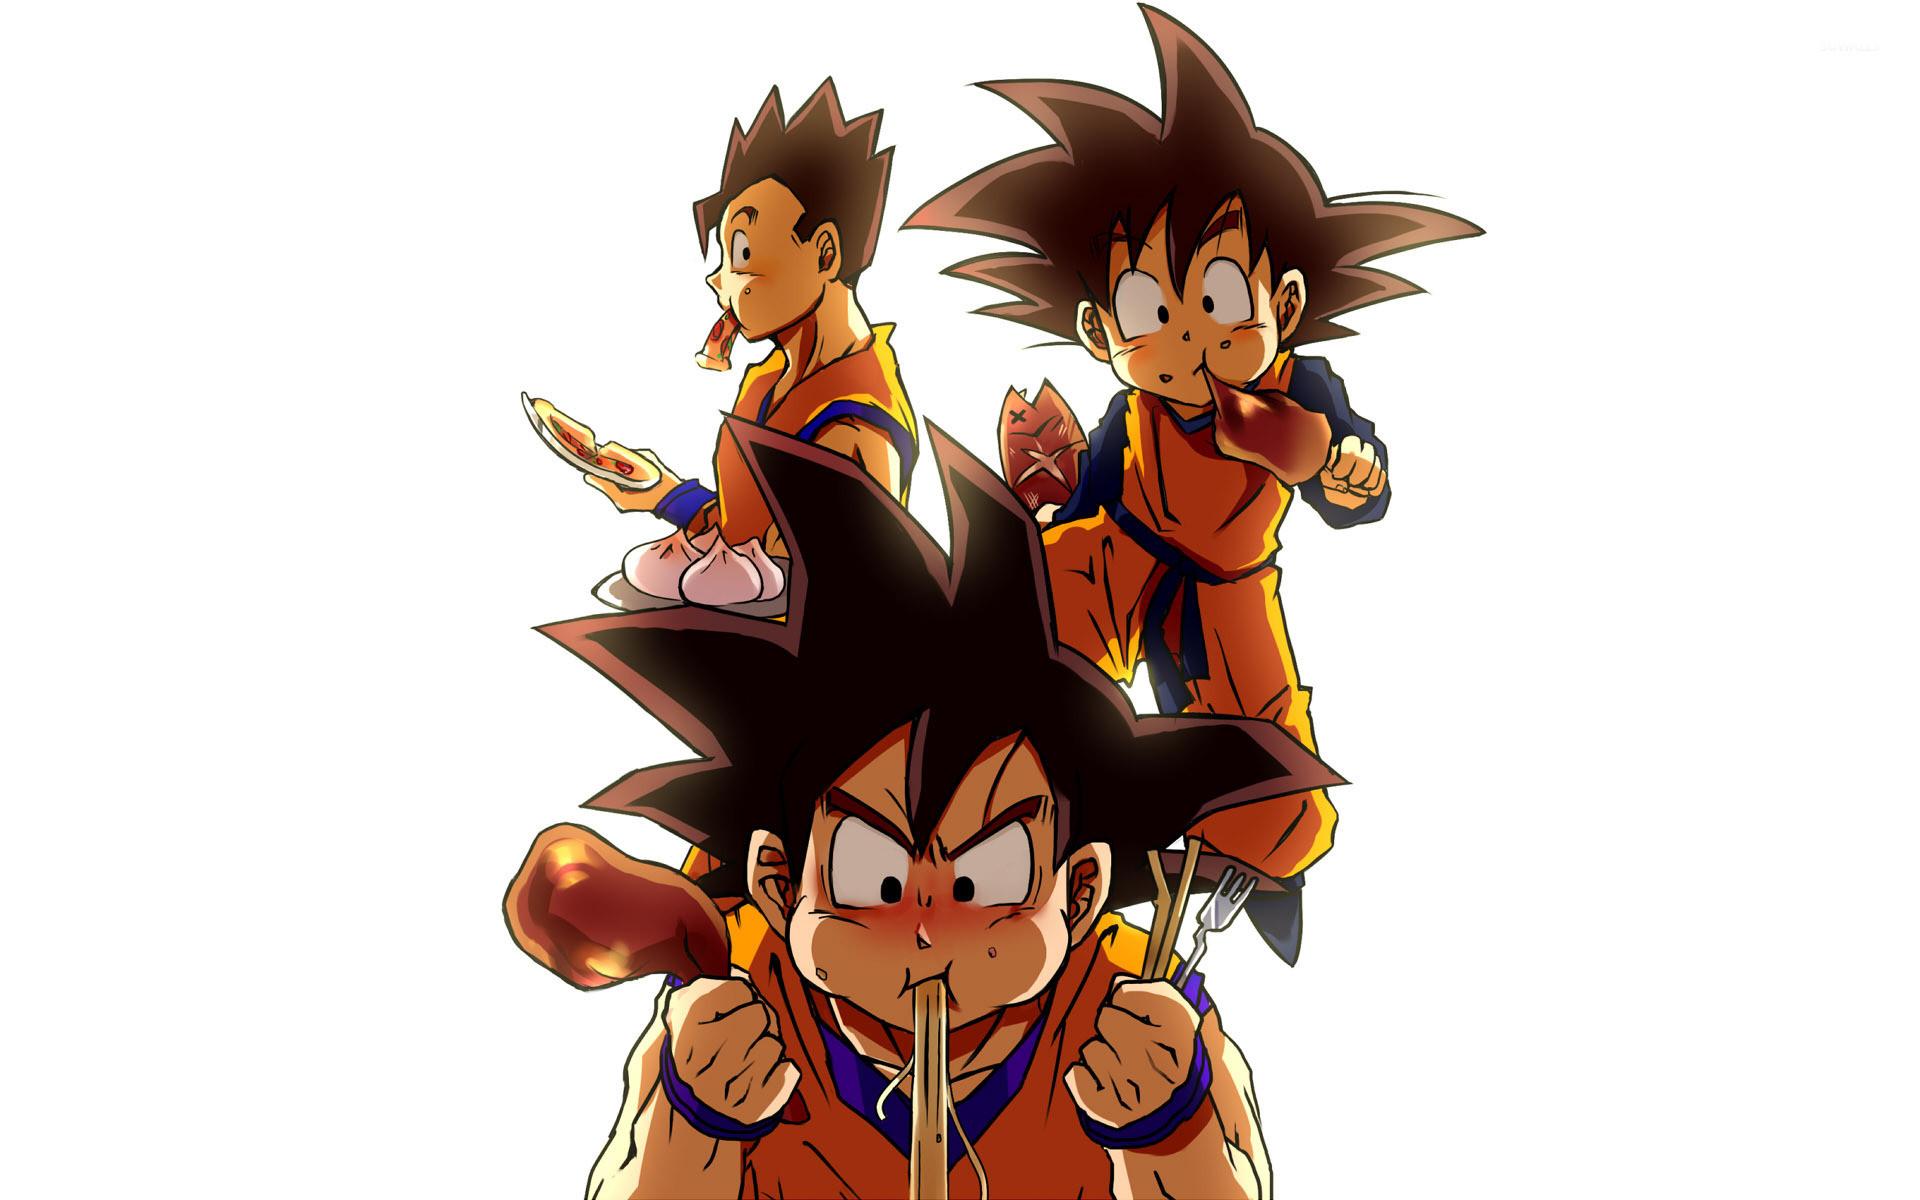 Goku wallpaper jpg